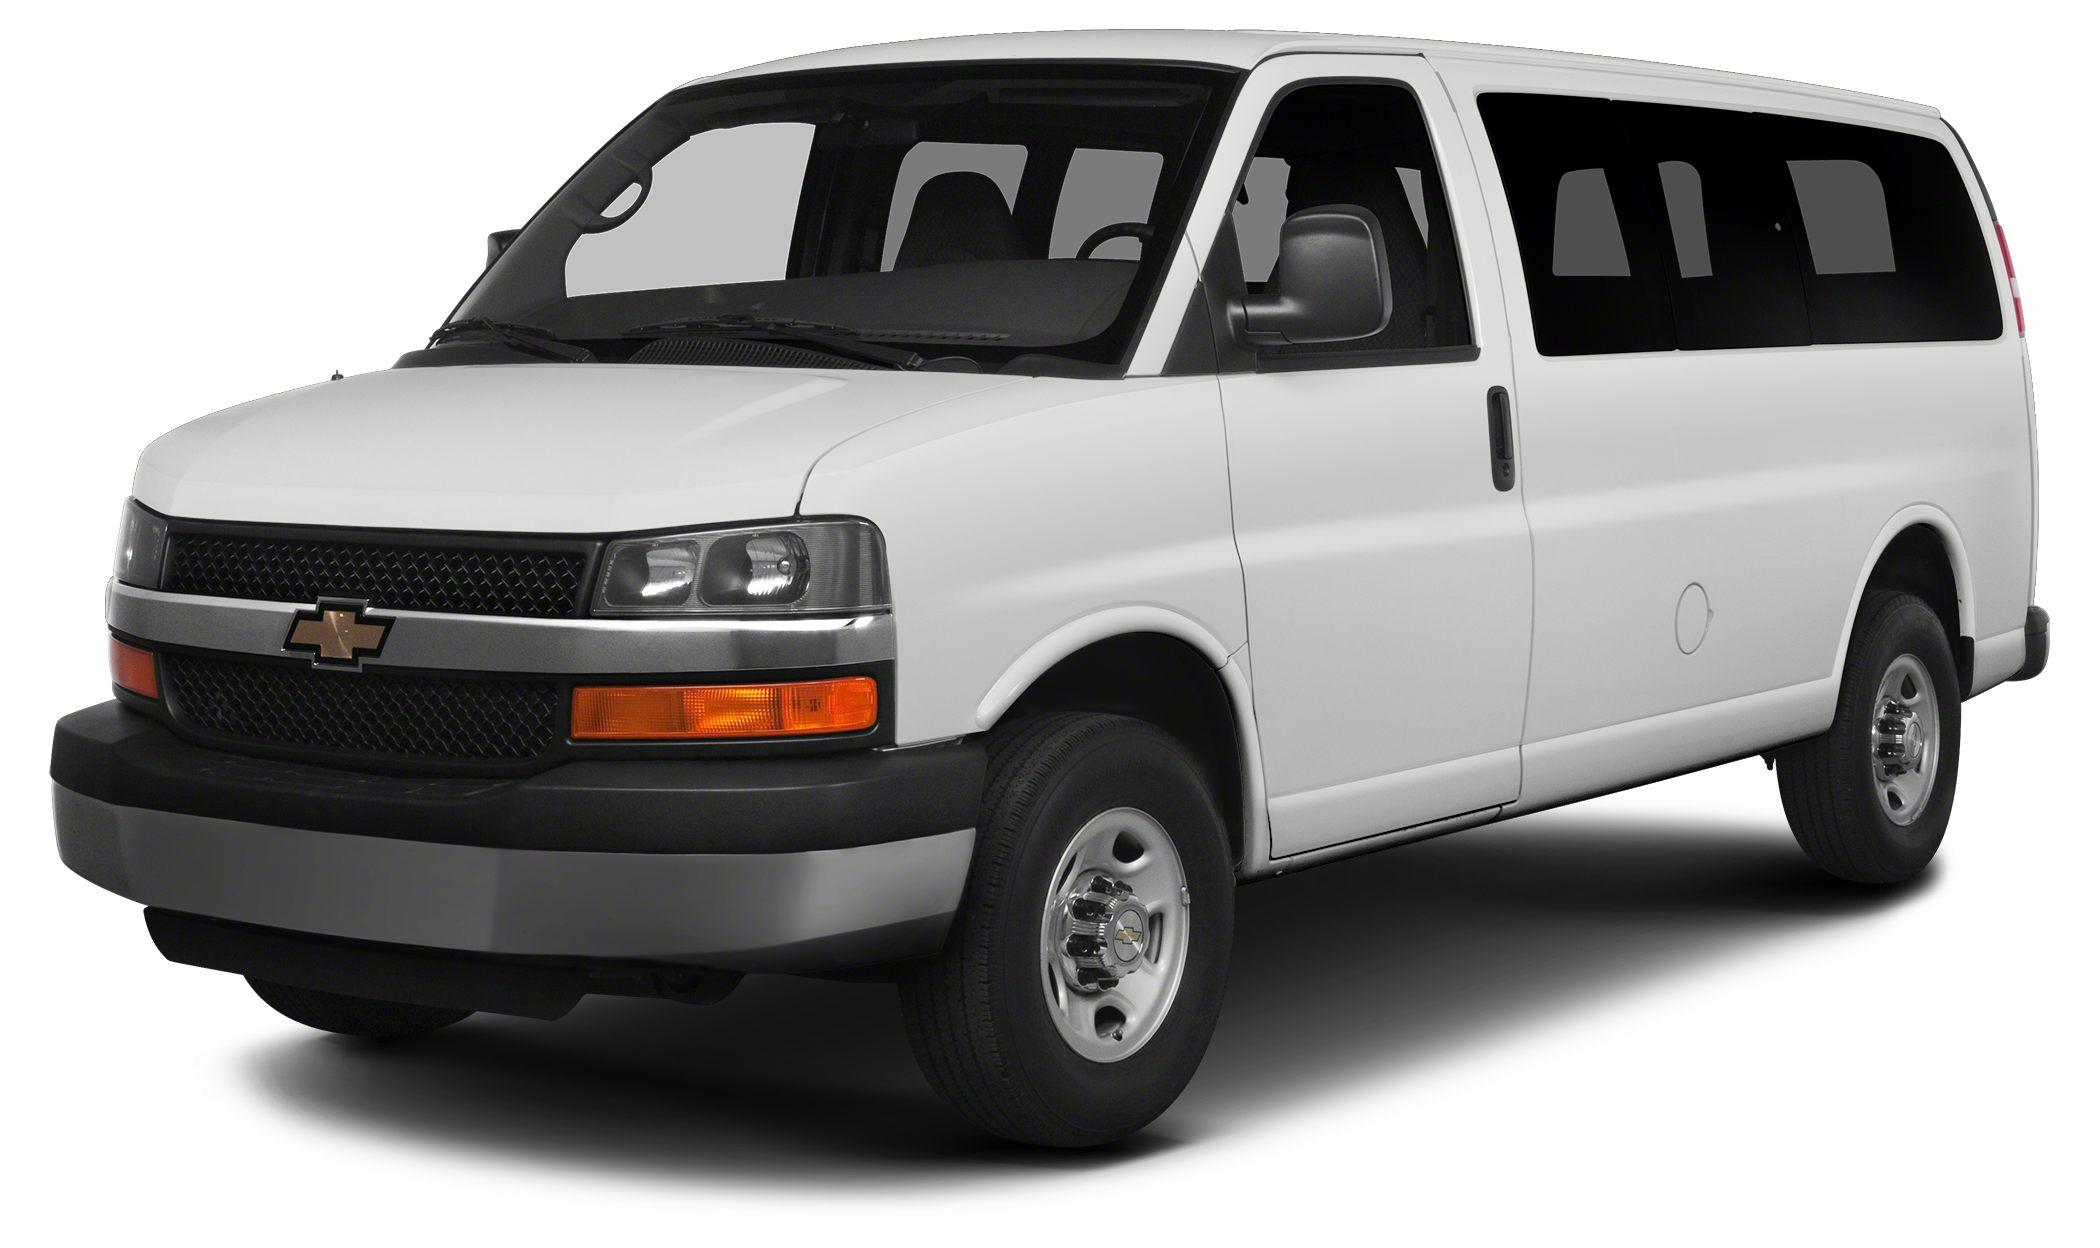 2014 Chevrolet Express 3500 LT Miles 0Color White Stock 27625 VIN 1GAZG1FA4E1197645